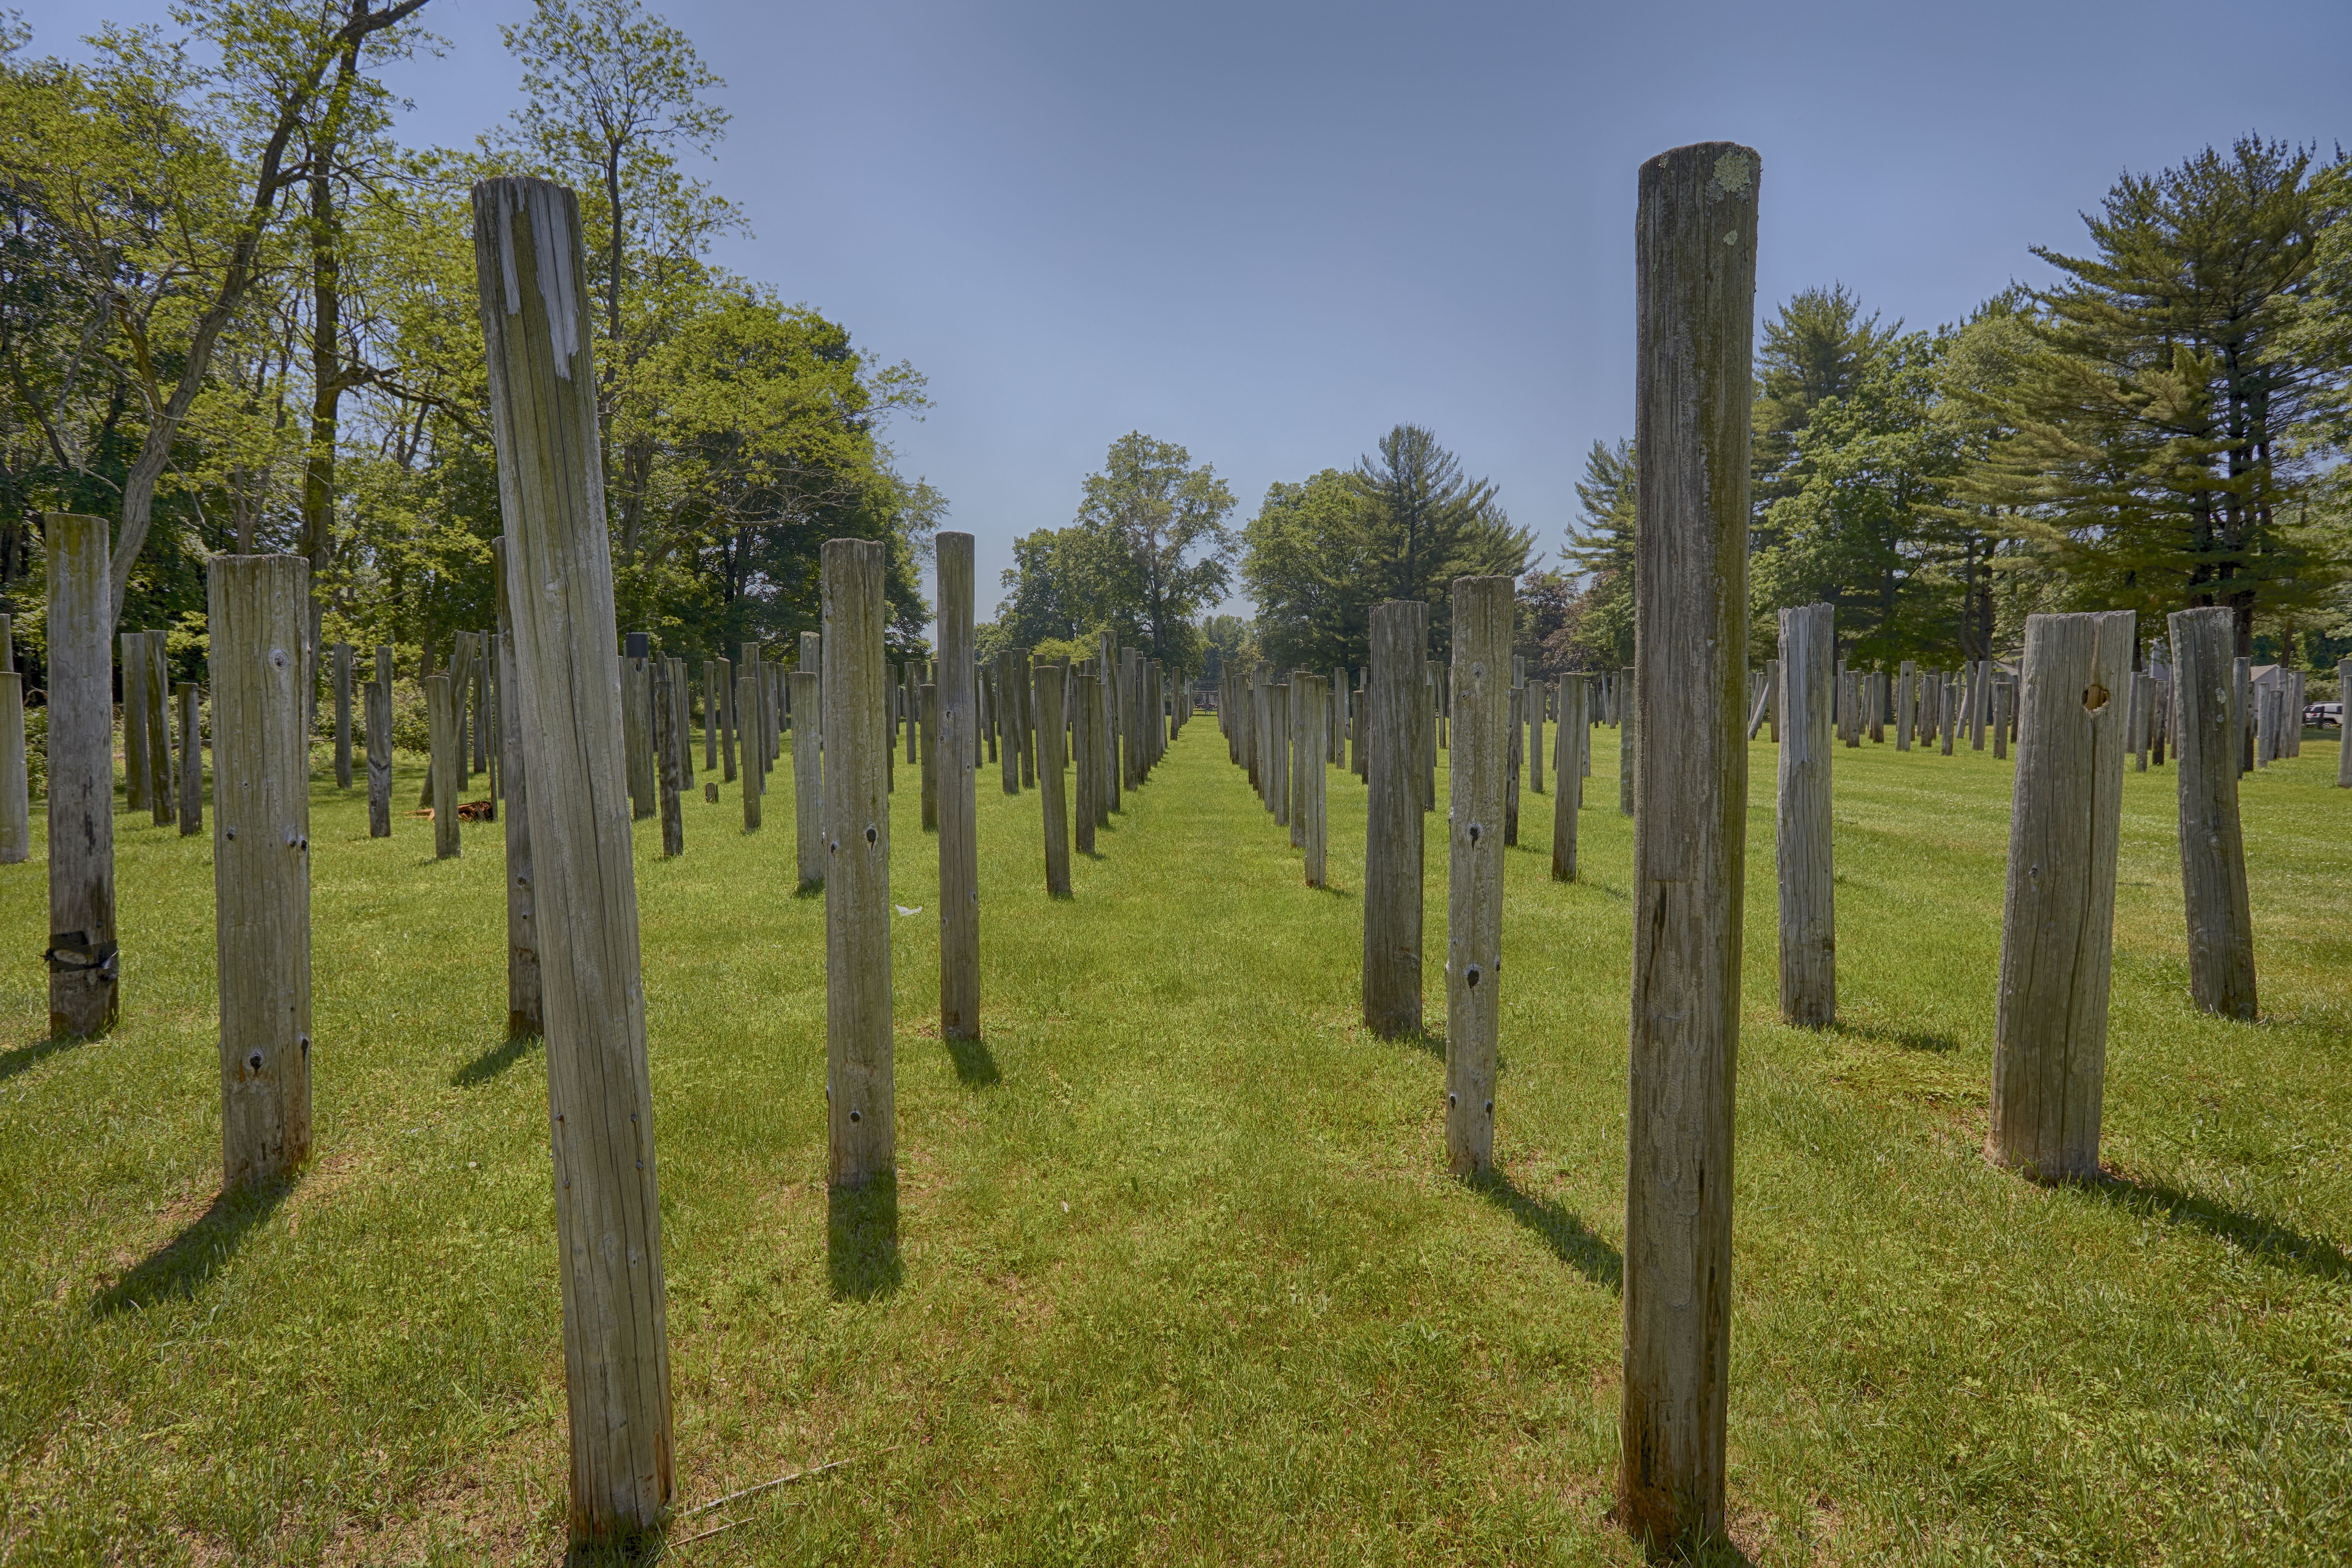 Rows of telephone poles.